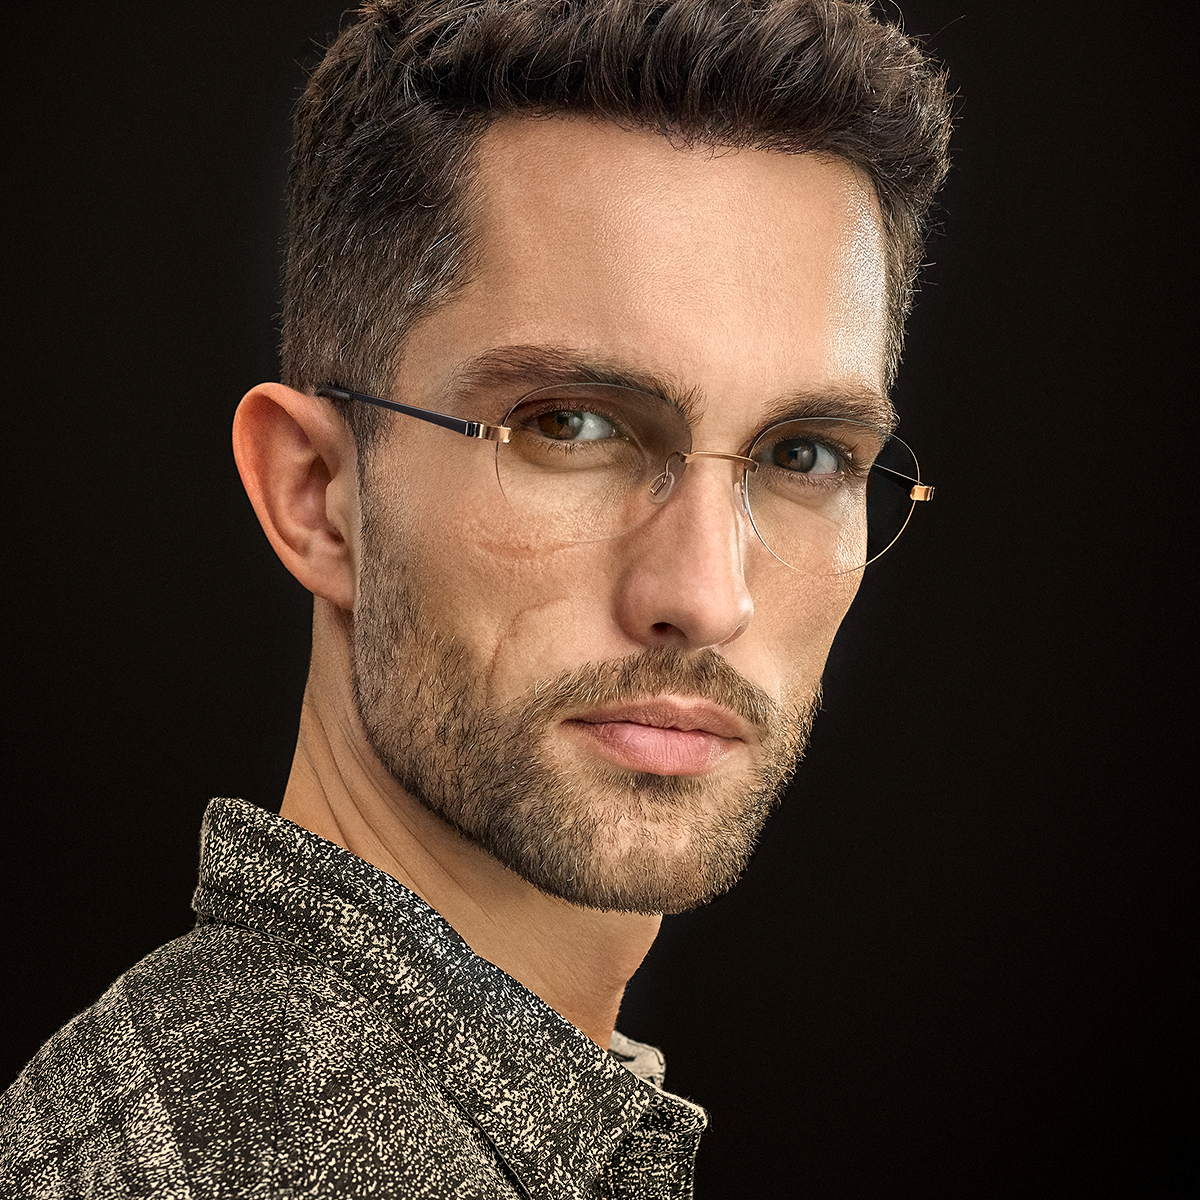 Lindberg eyeglasses